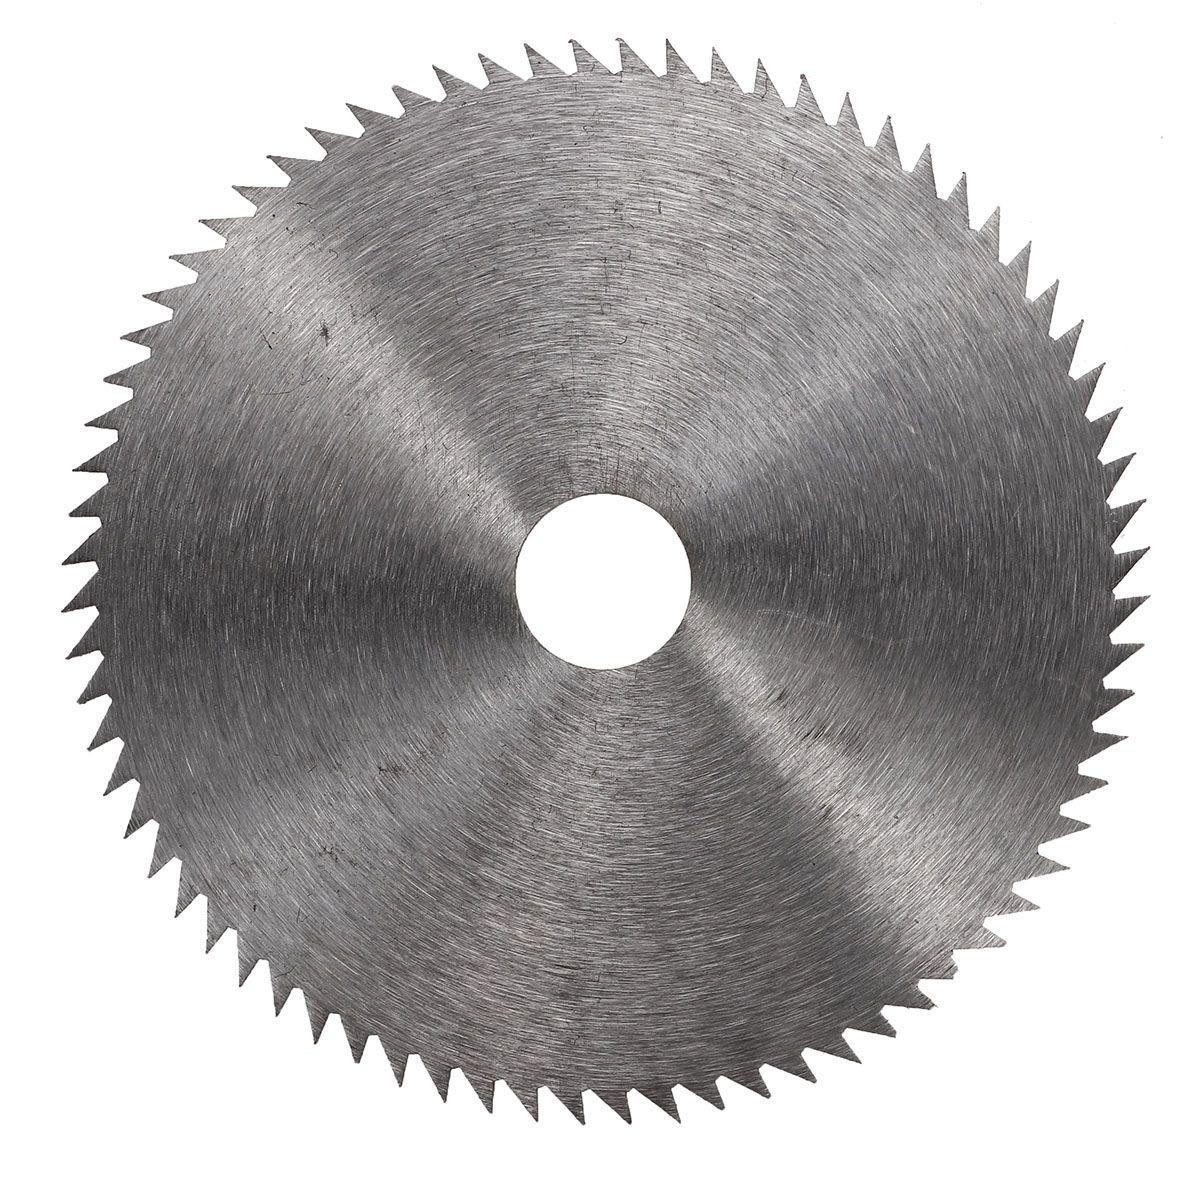 5 Inch Circular Saw Blade Bore Diameter 125mm Wheel Cutting Disc 125mm Wheel Cutting Disc For Mini Table Saw Woodworking